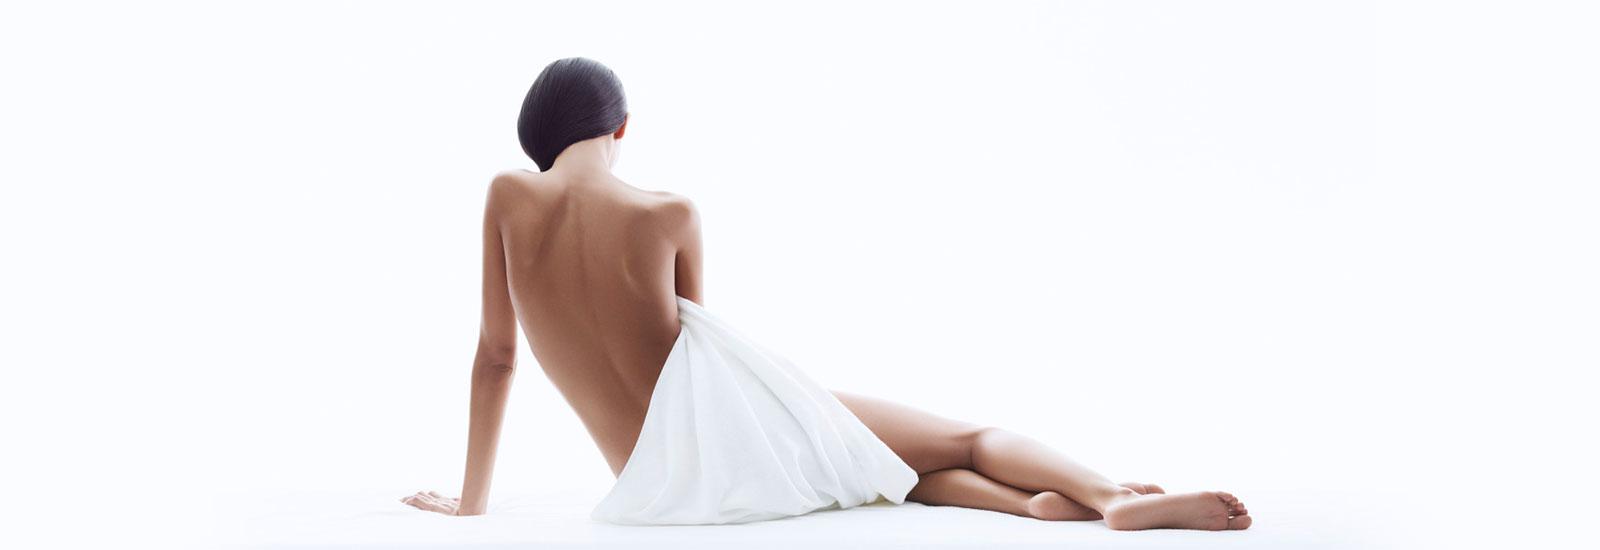 SIGNATURE BODY TREATMENTS